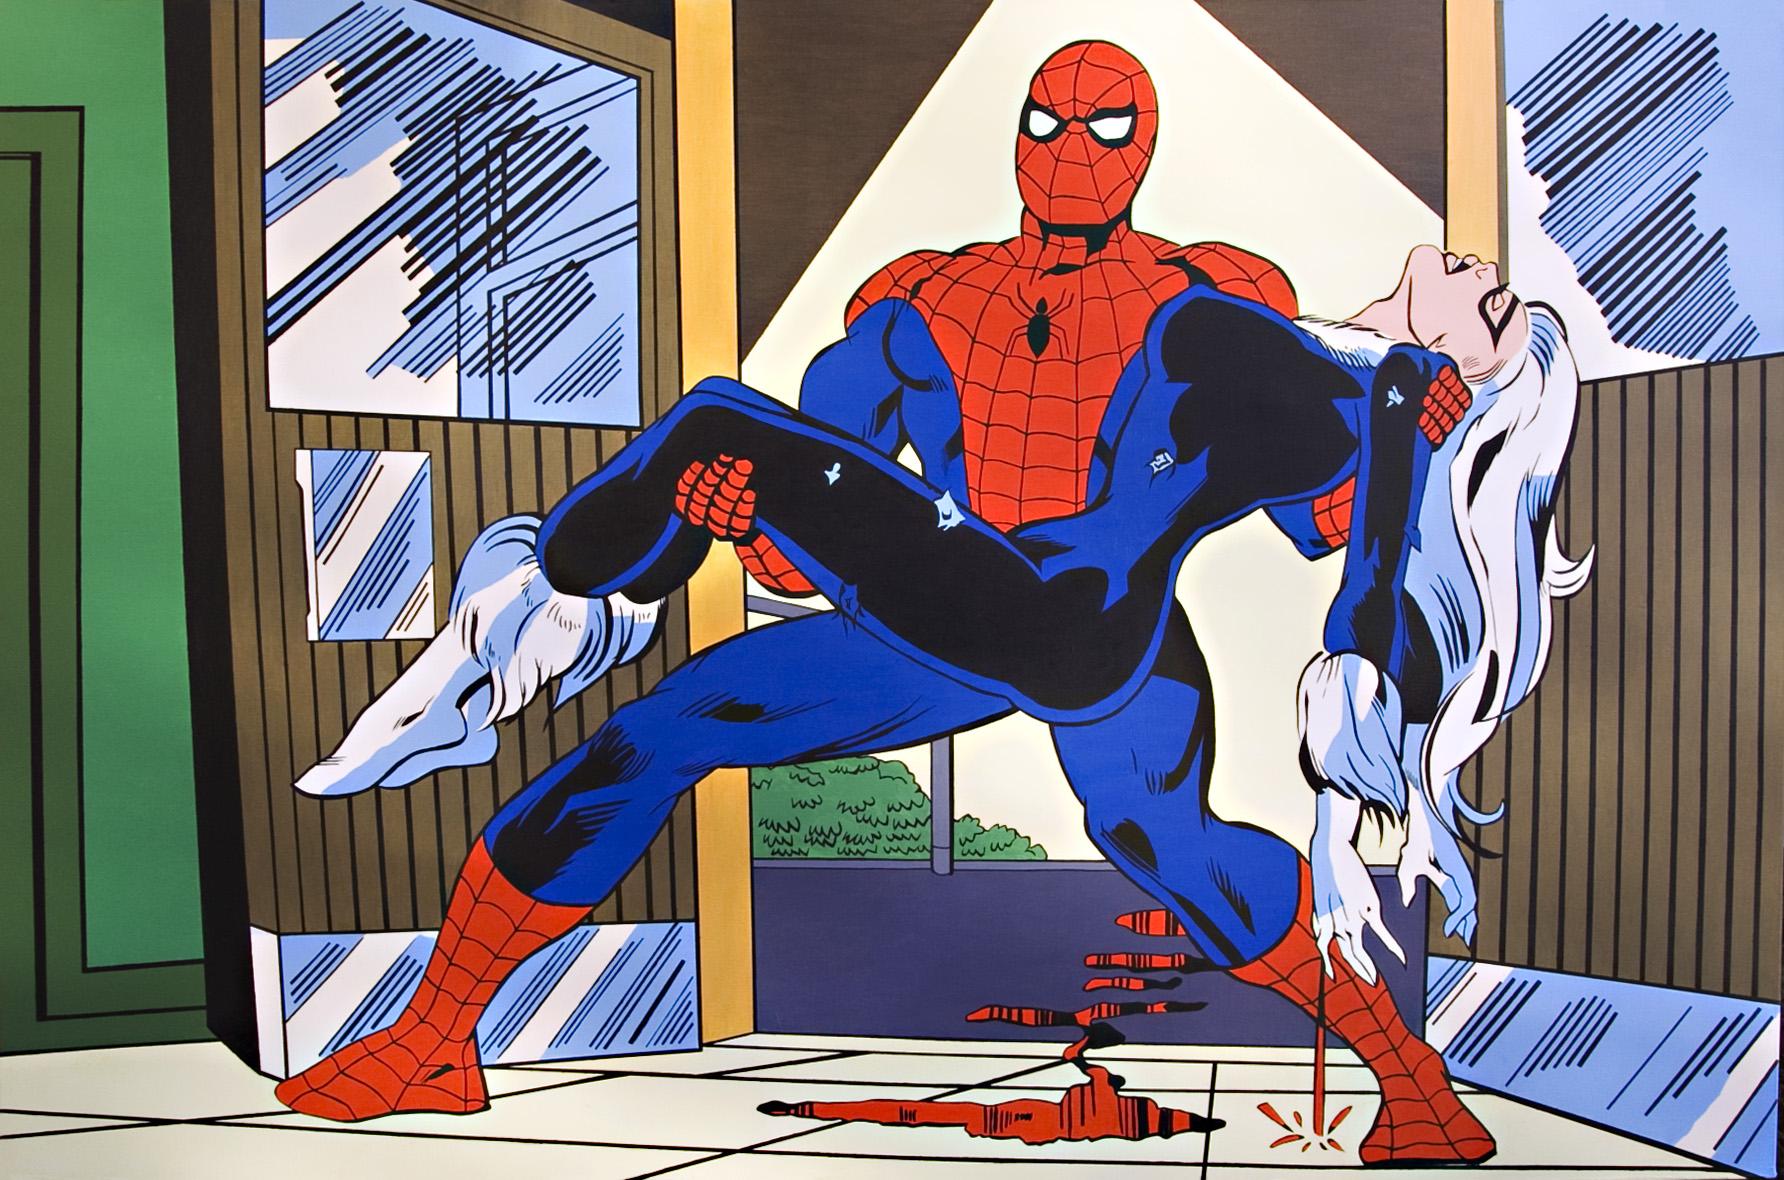 Spiderman 3, 2010